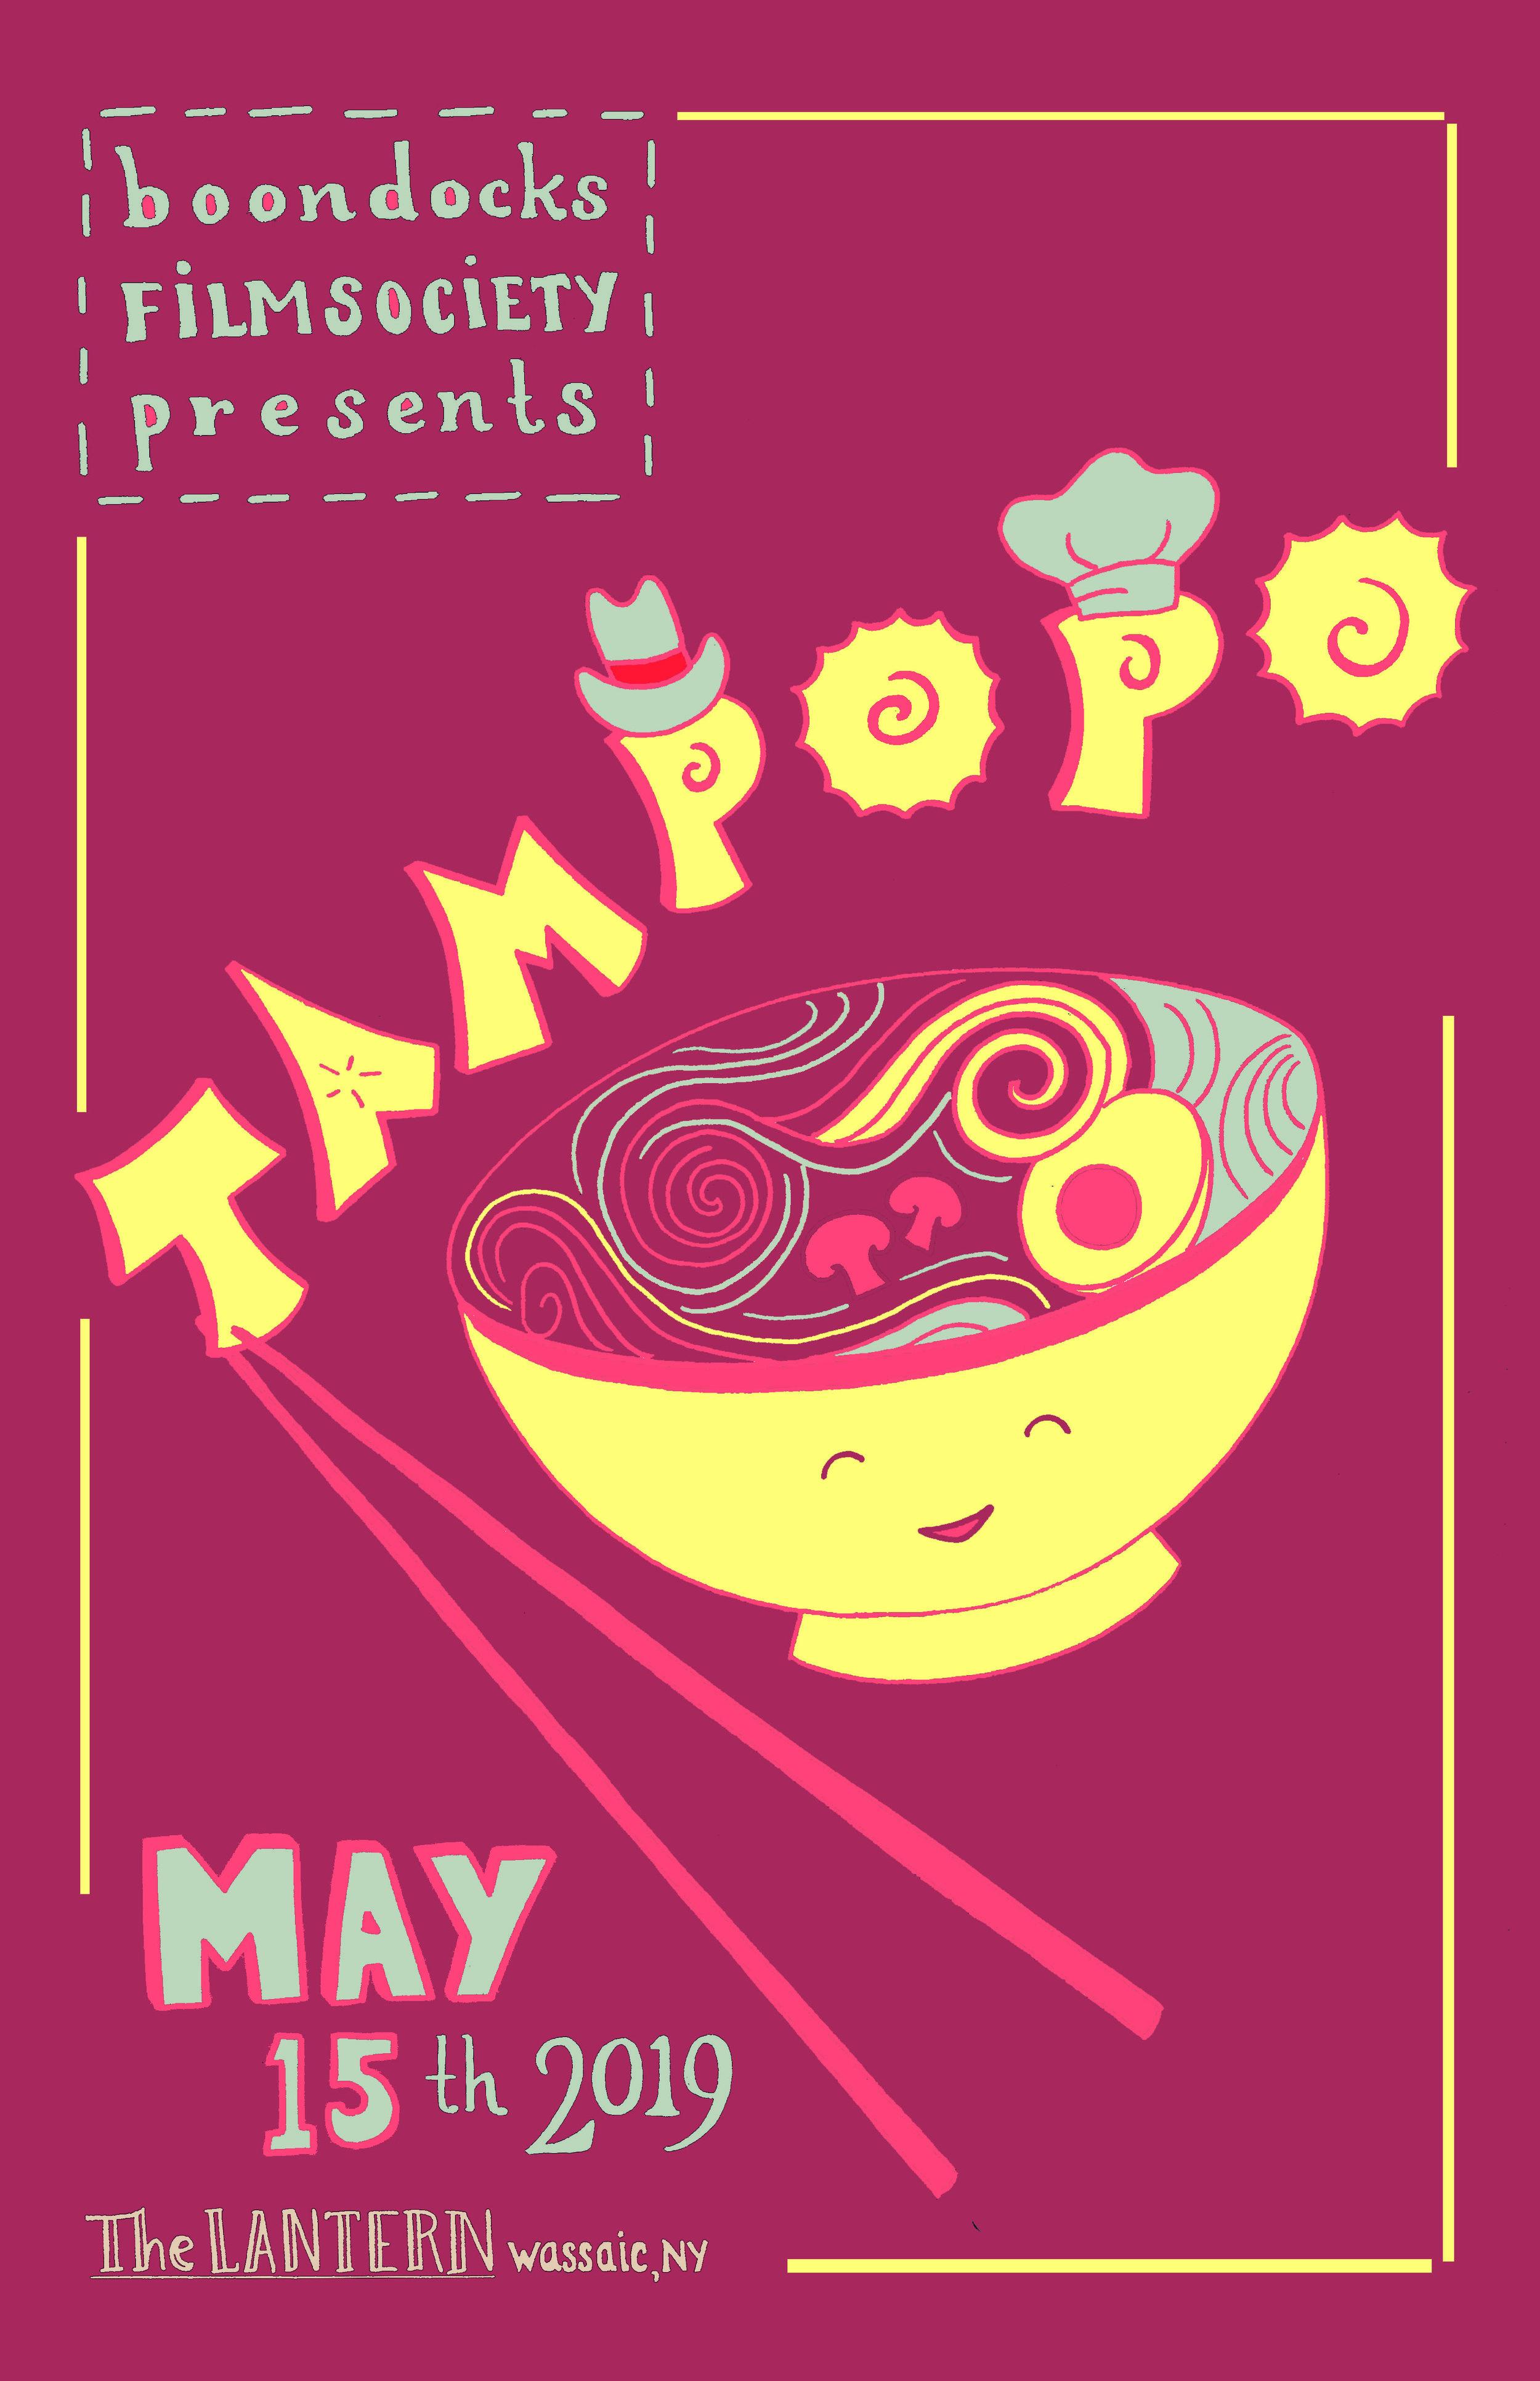 Tampopo at the Lantern!